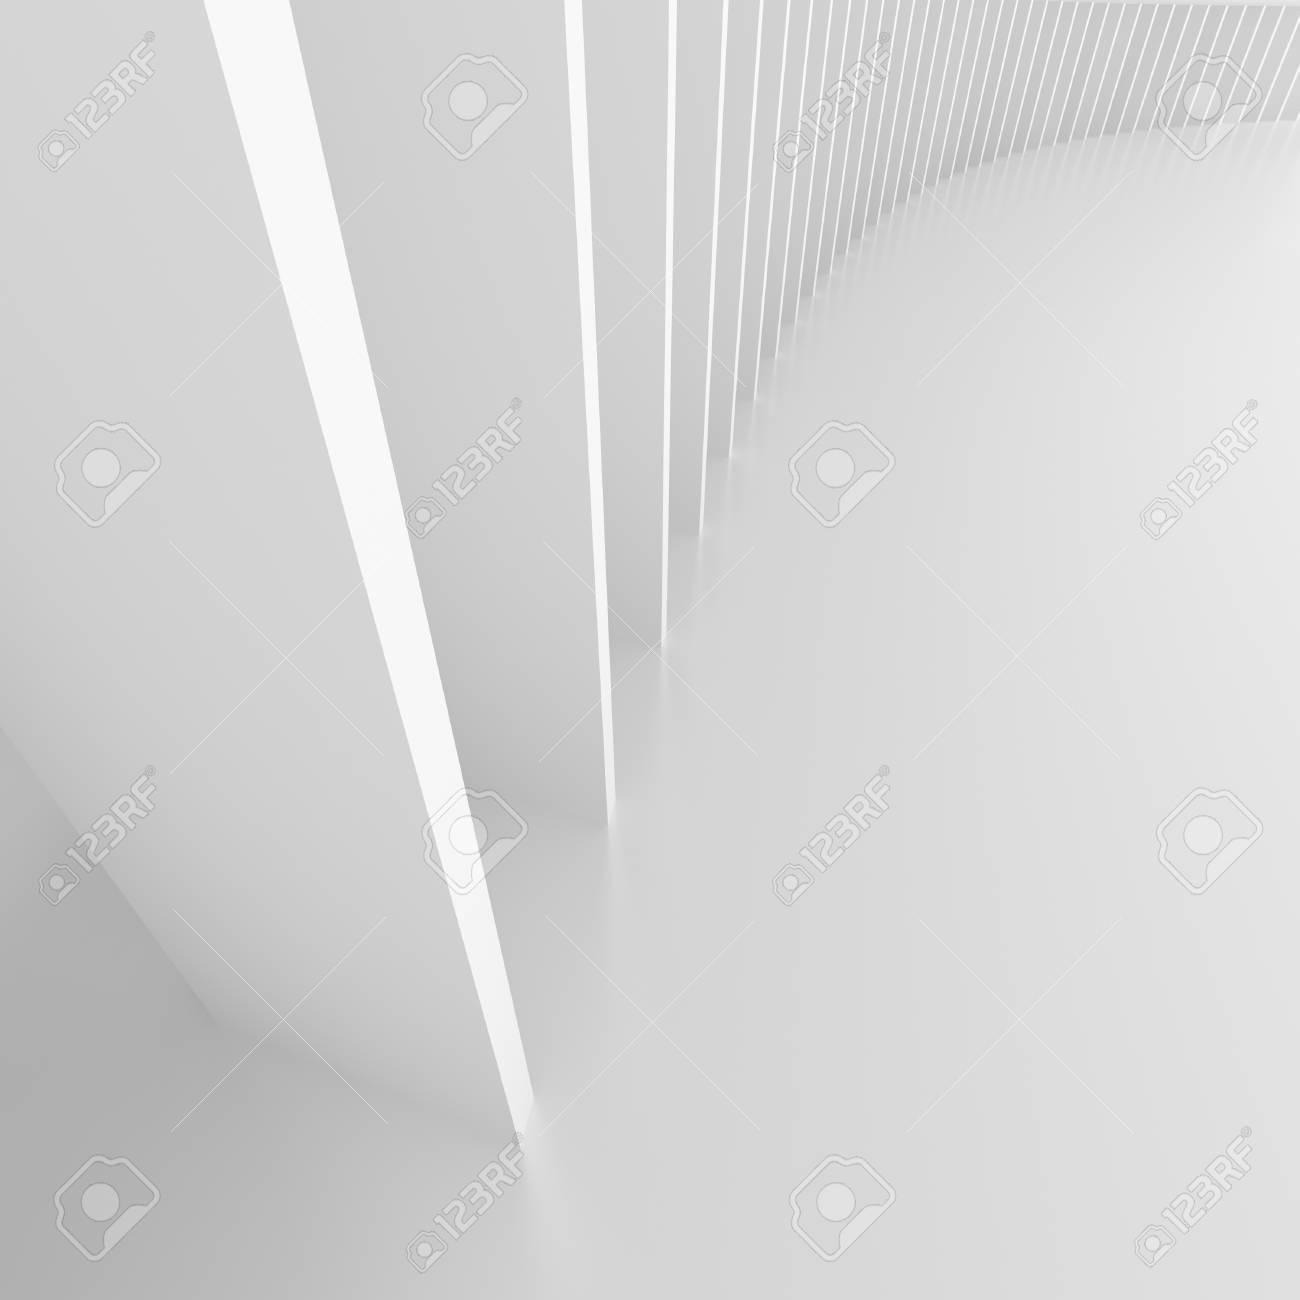 Architecture Background Stock Photo - 8481552